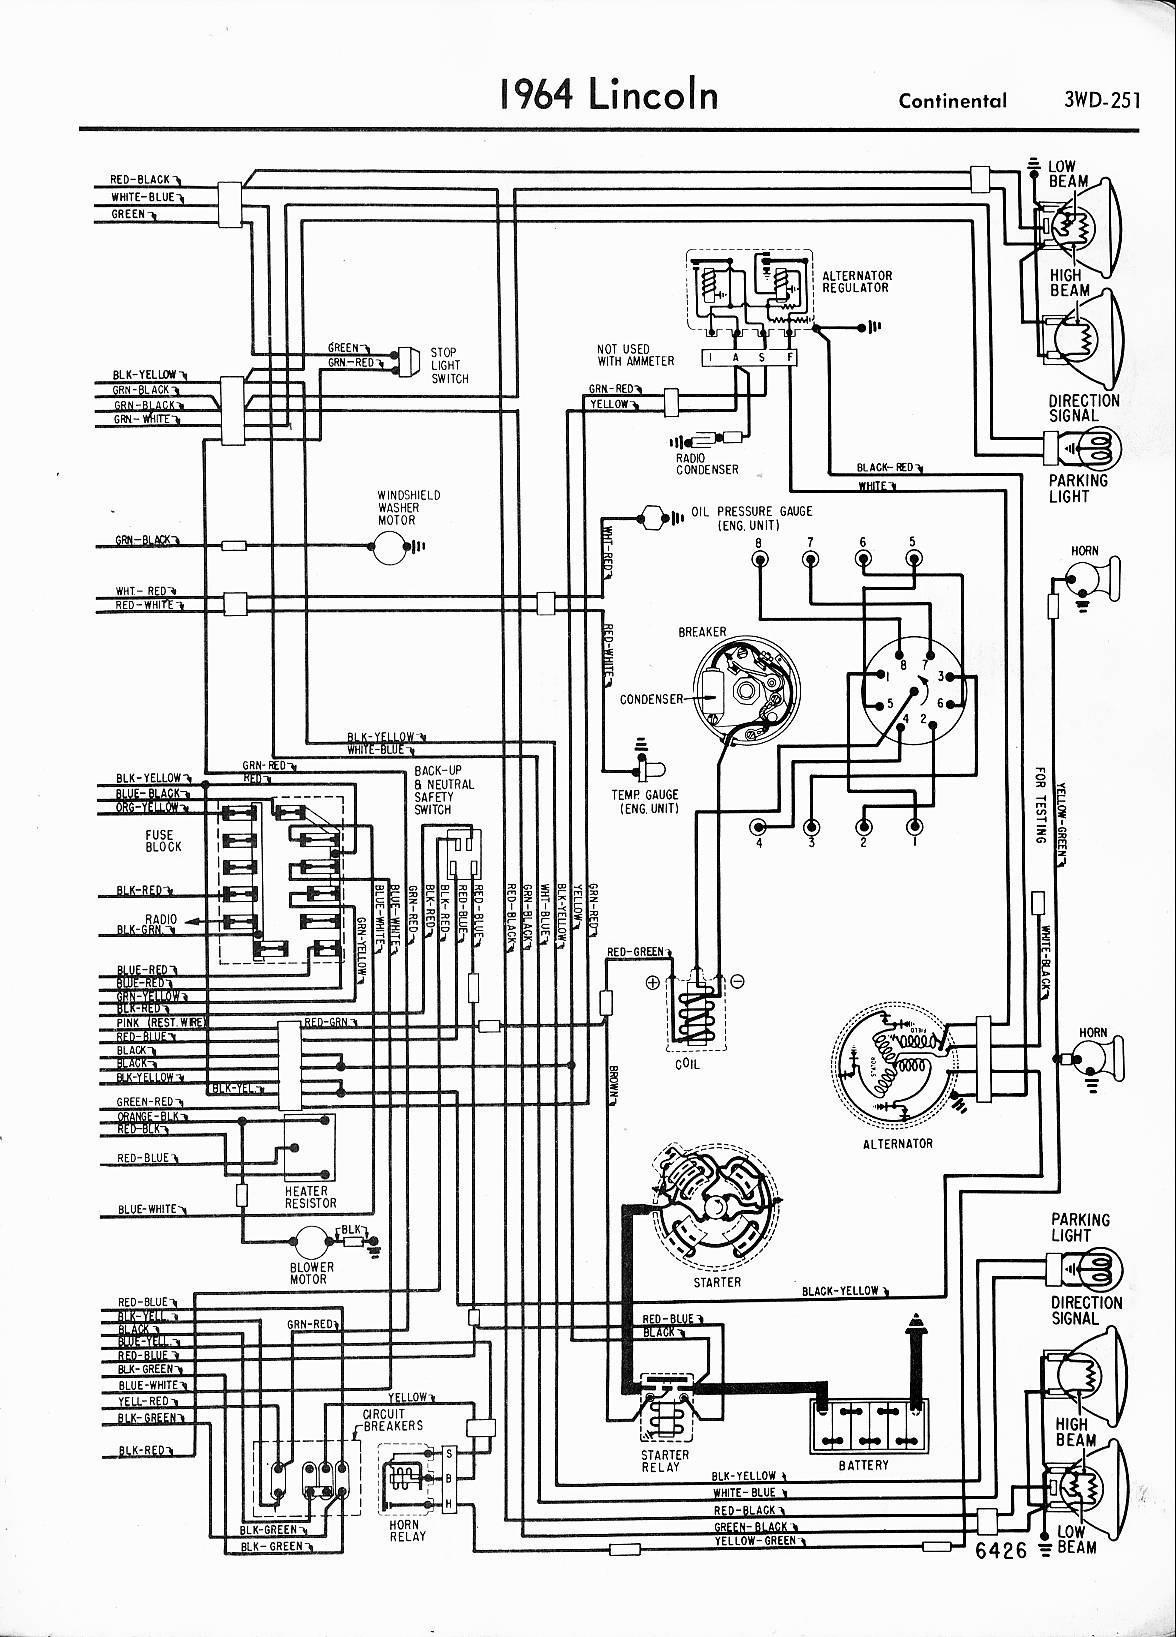 1966 lincoln engine diagram